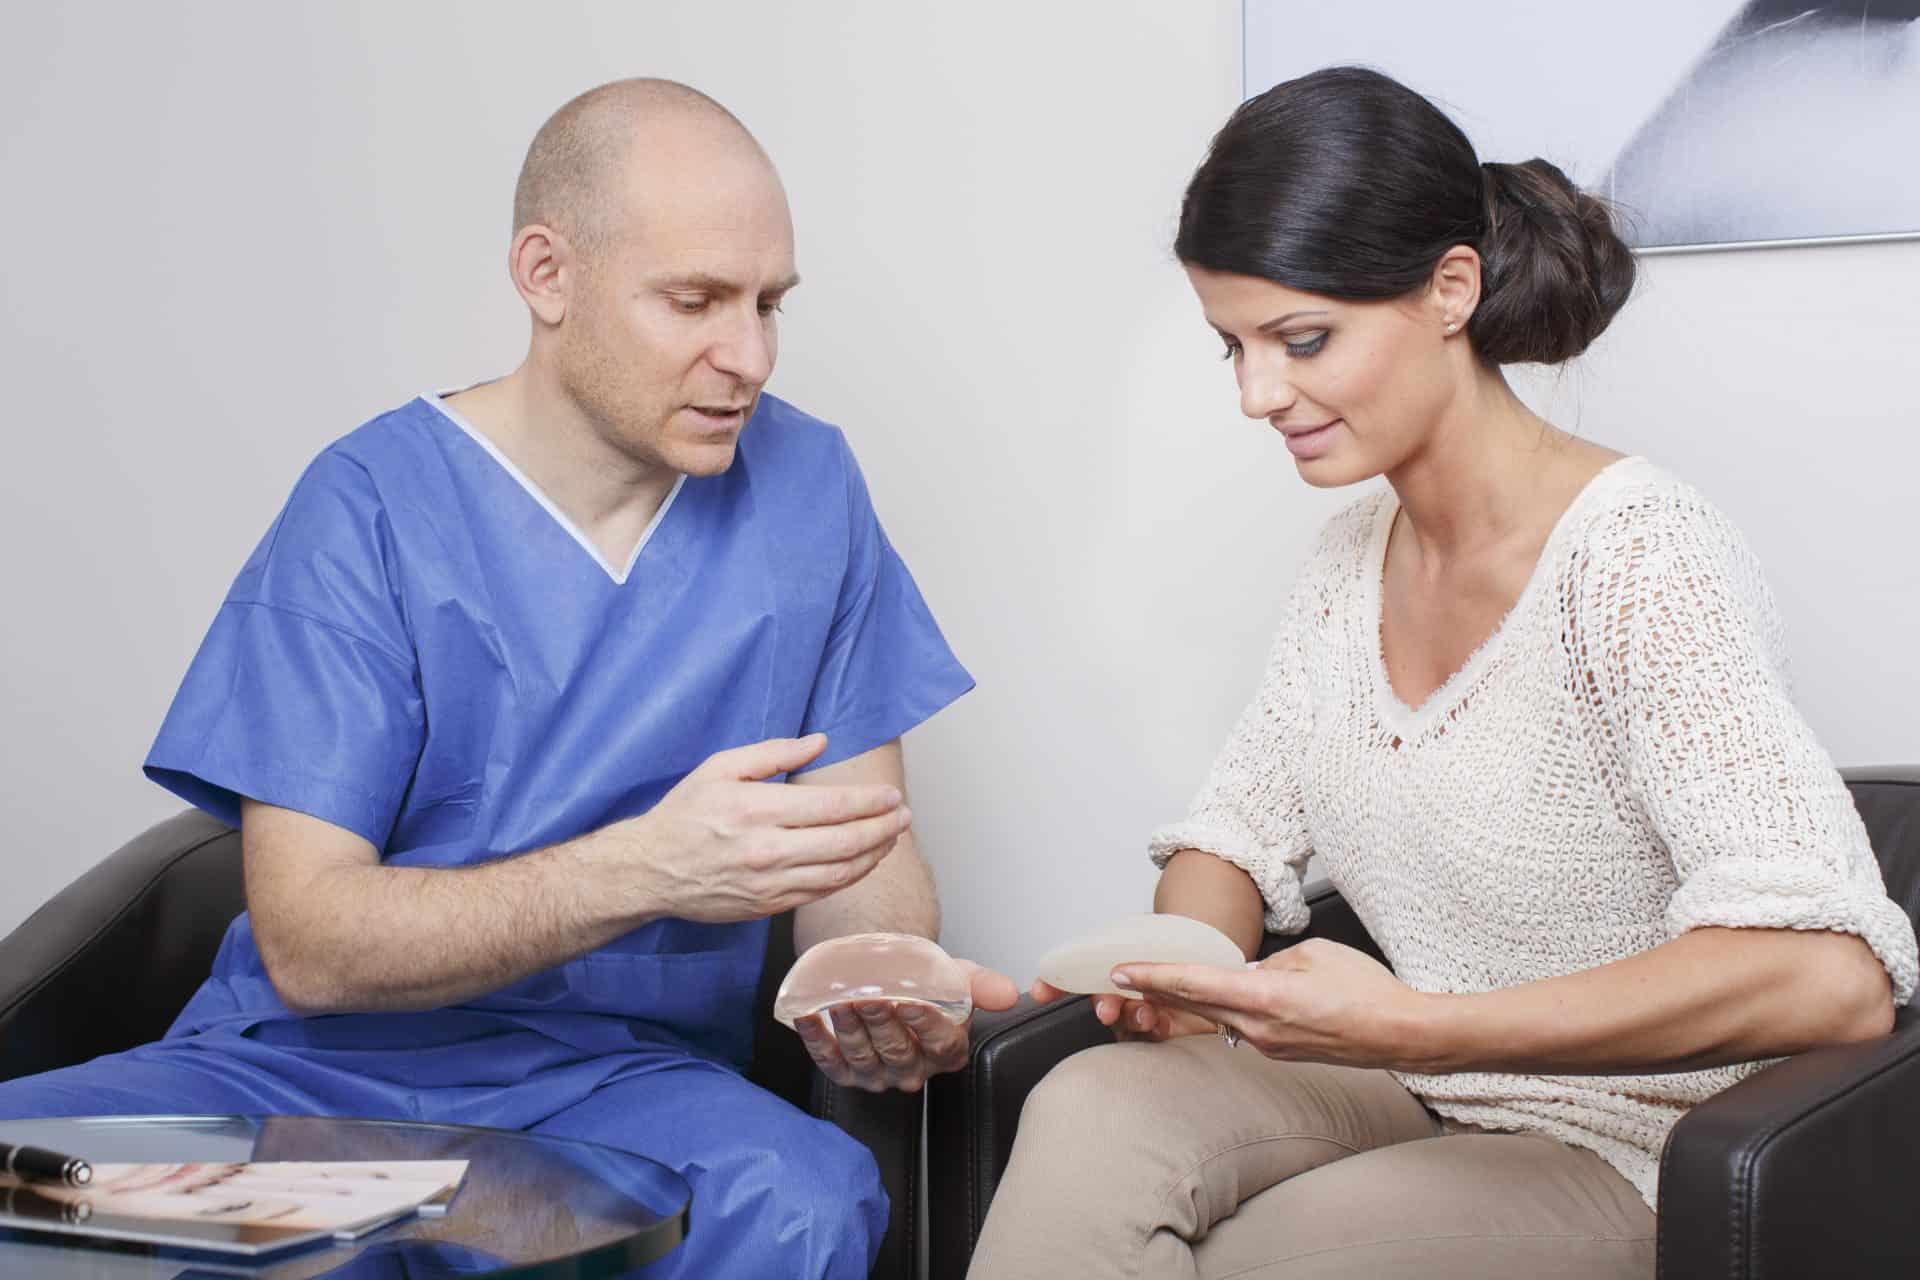 Brustvergrößerung, Implantat, Beratung